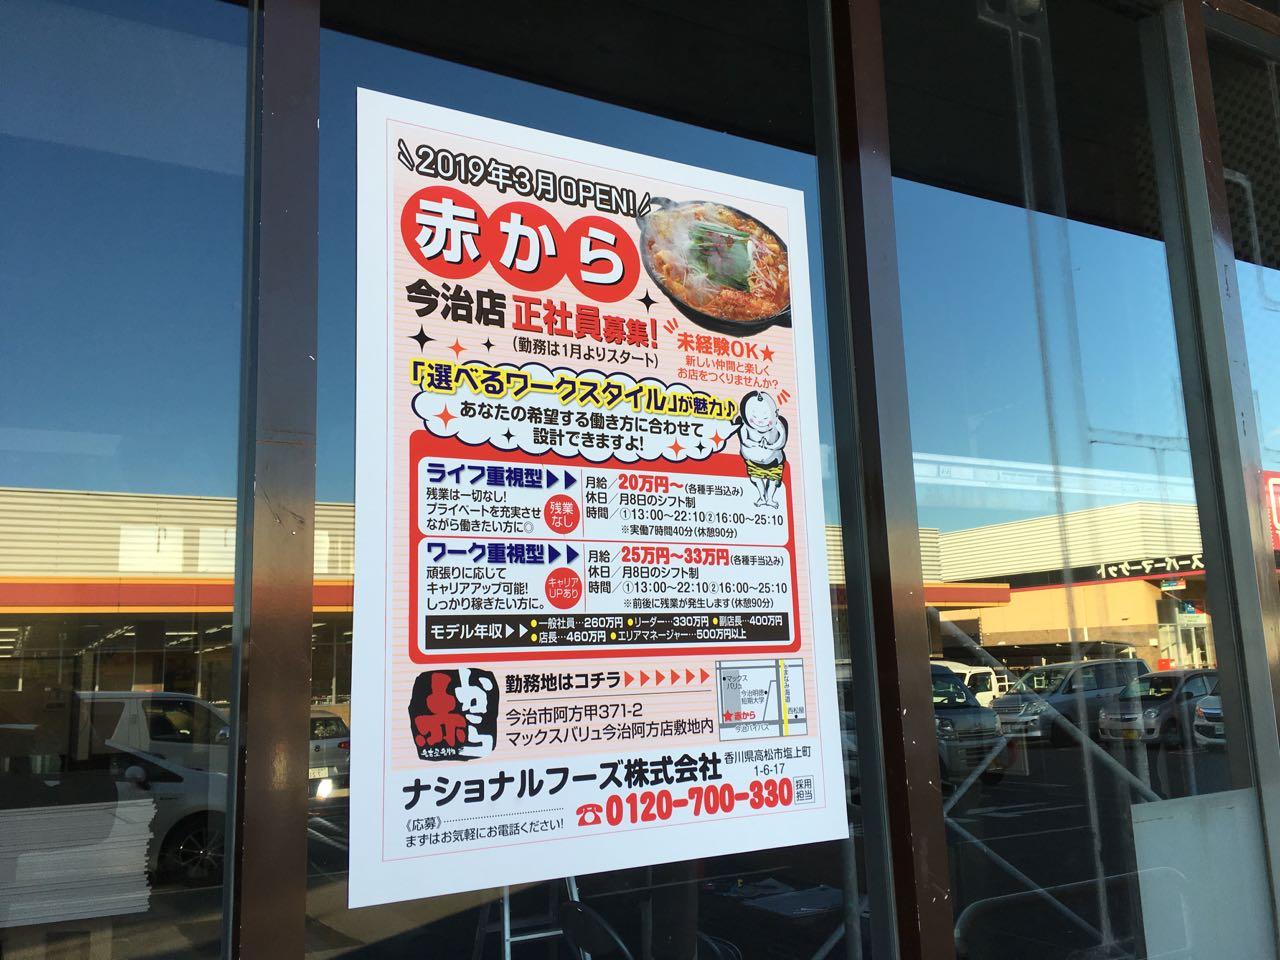 ehime,imabari,みとん今治,今治,愛媛,新規オープン,赤から,鍋